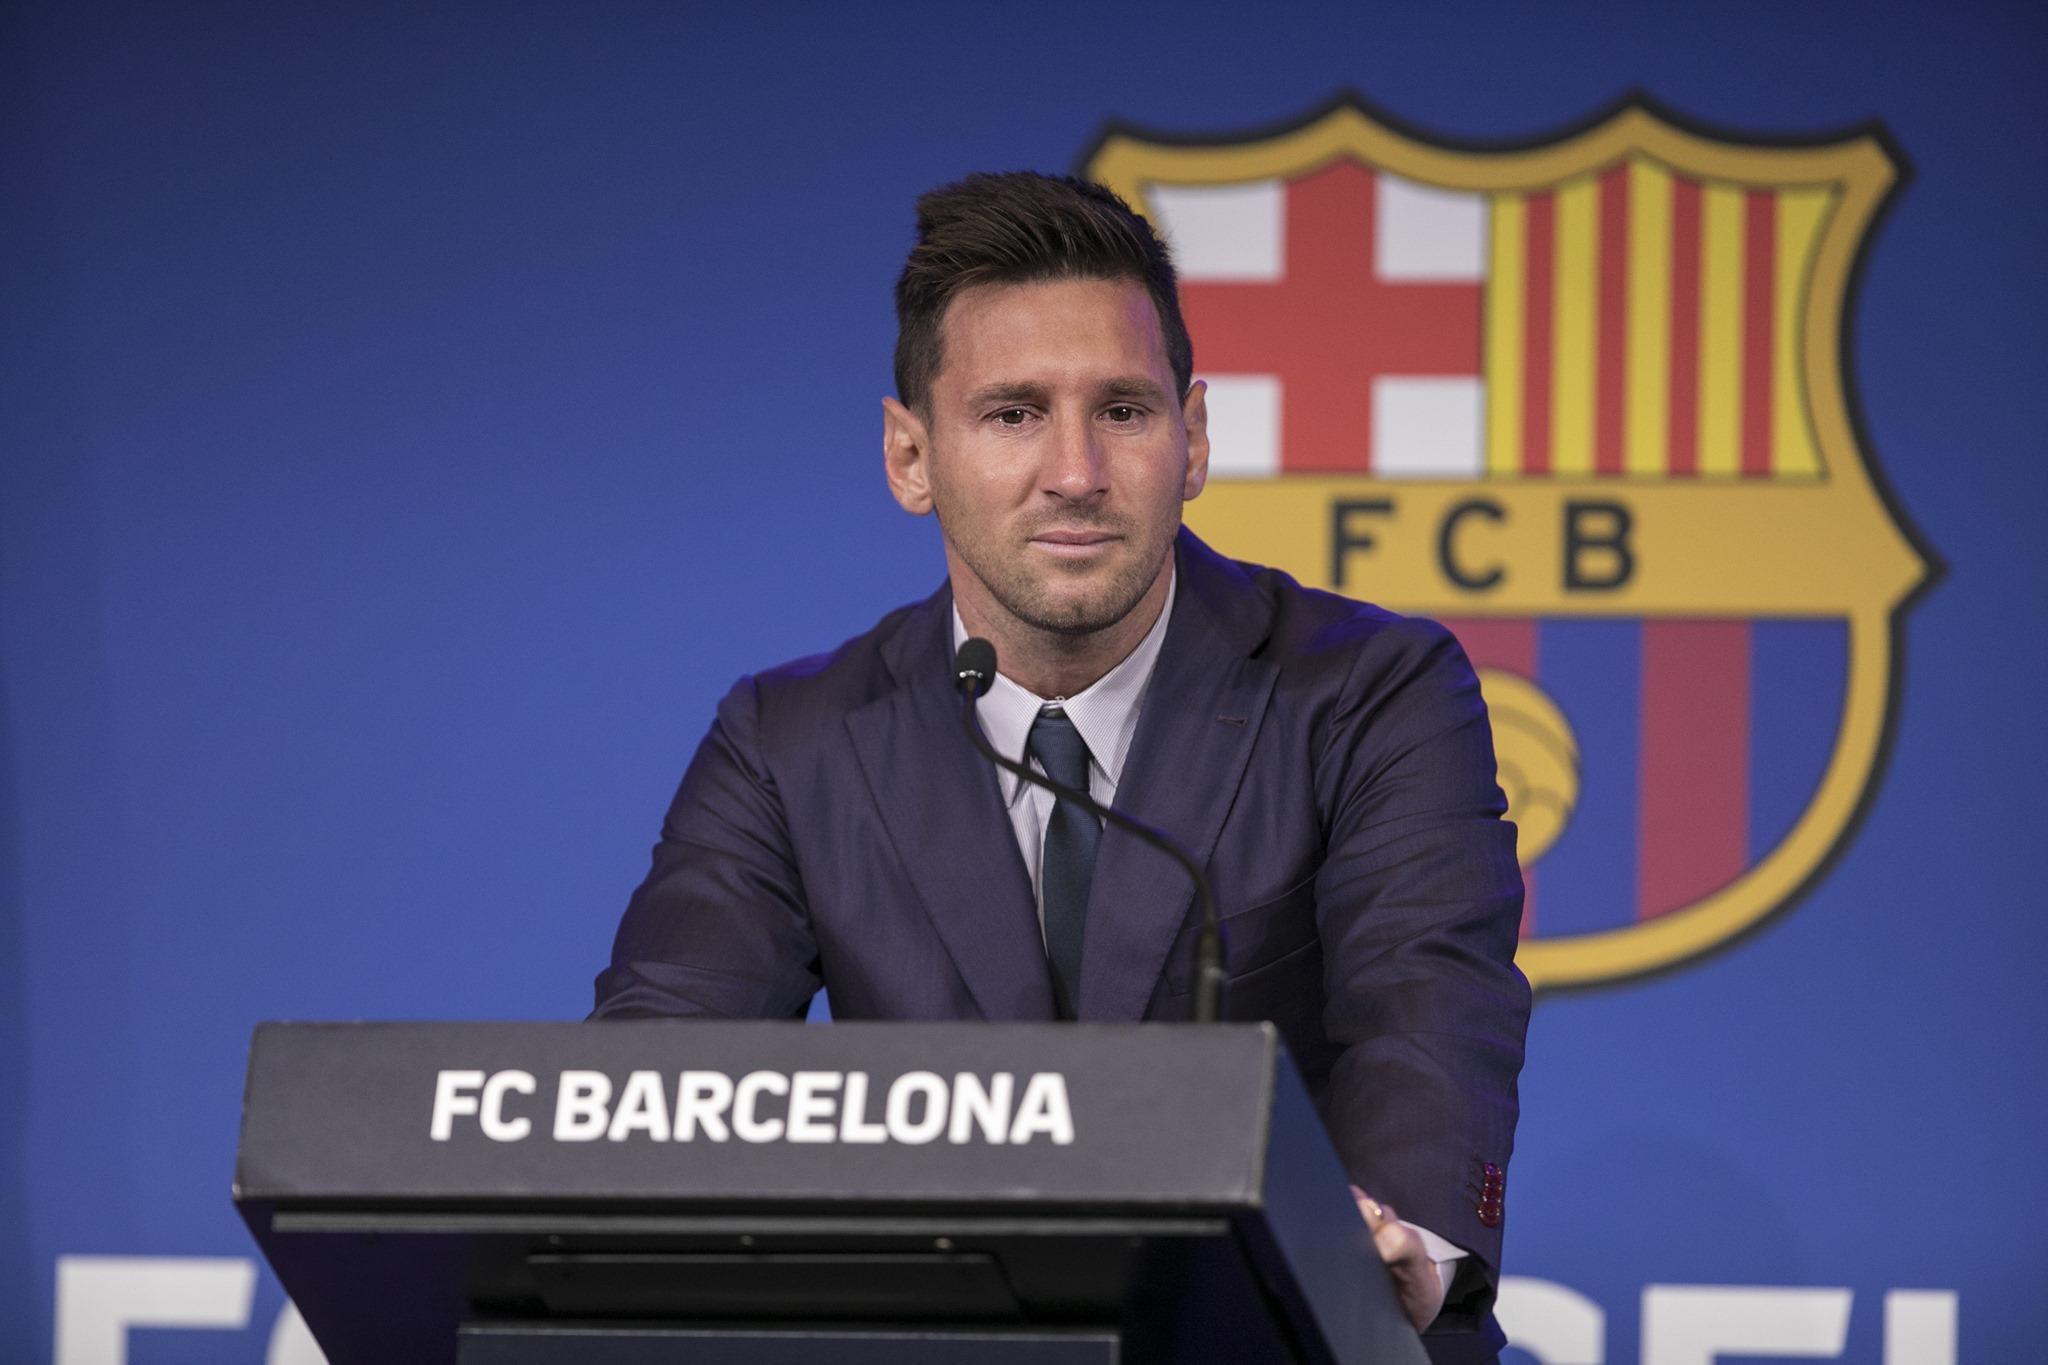 Lionel Messi:బార్సిలోనాకు గుడ్బై చెబుతూ భావోద్వేగానికి గురైన స్టార్ ప్లేయర్